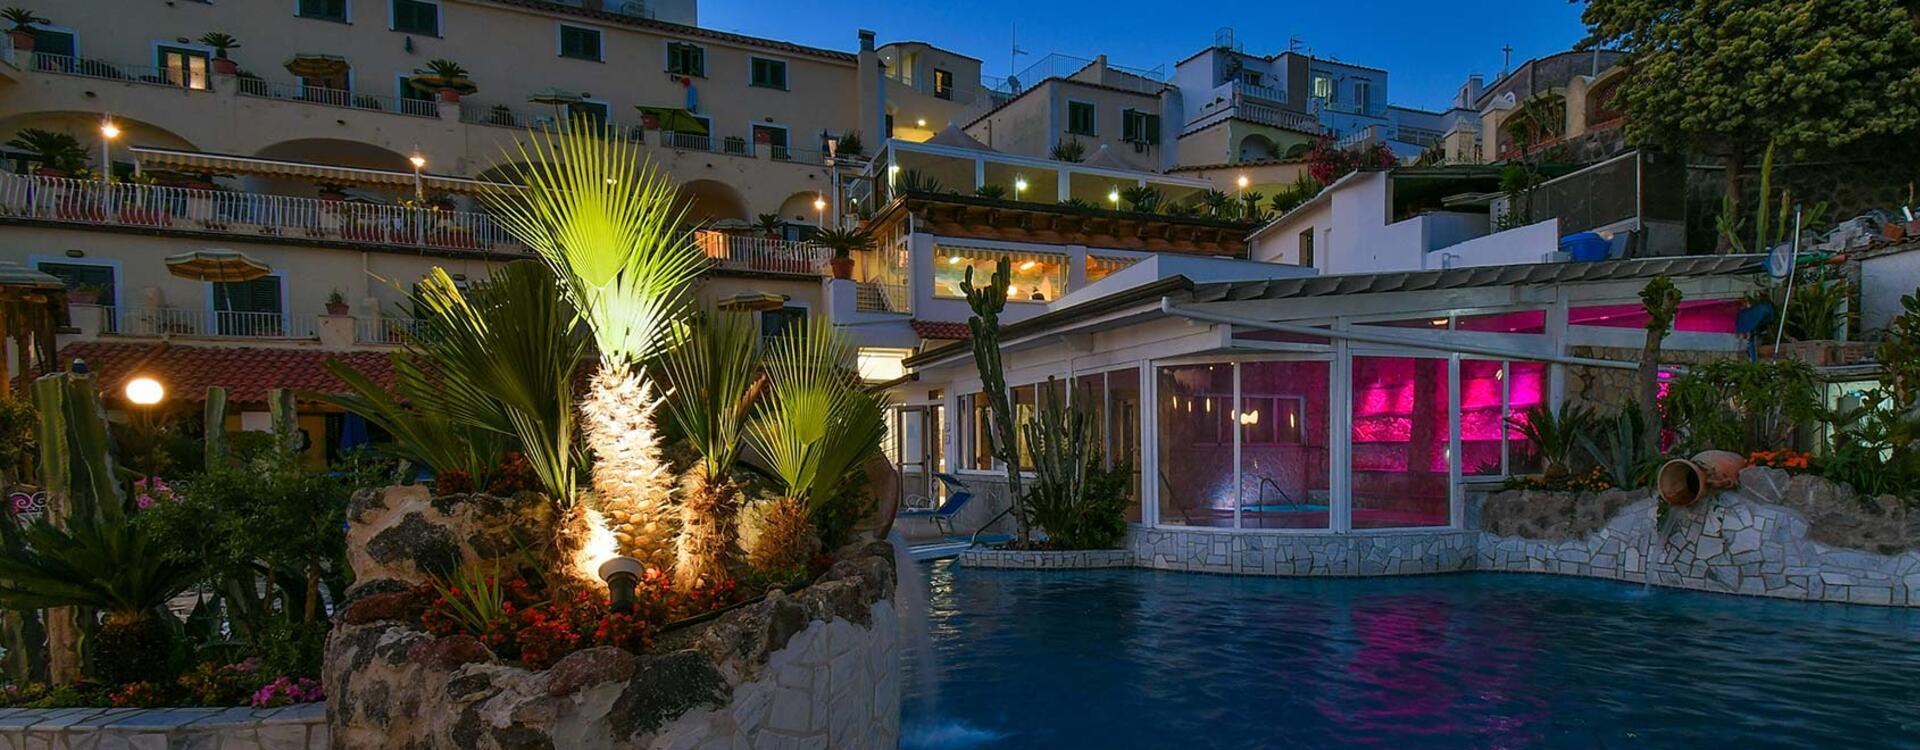 hotelsaintraphaelischia en hotel 010